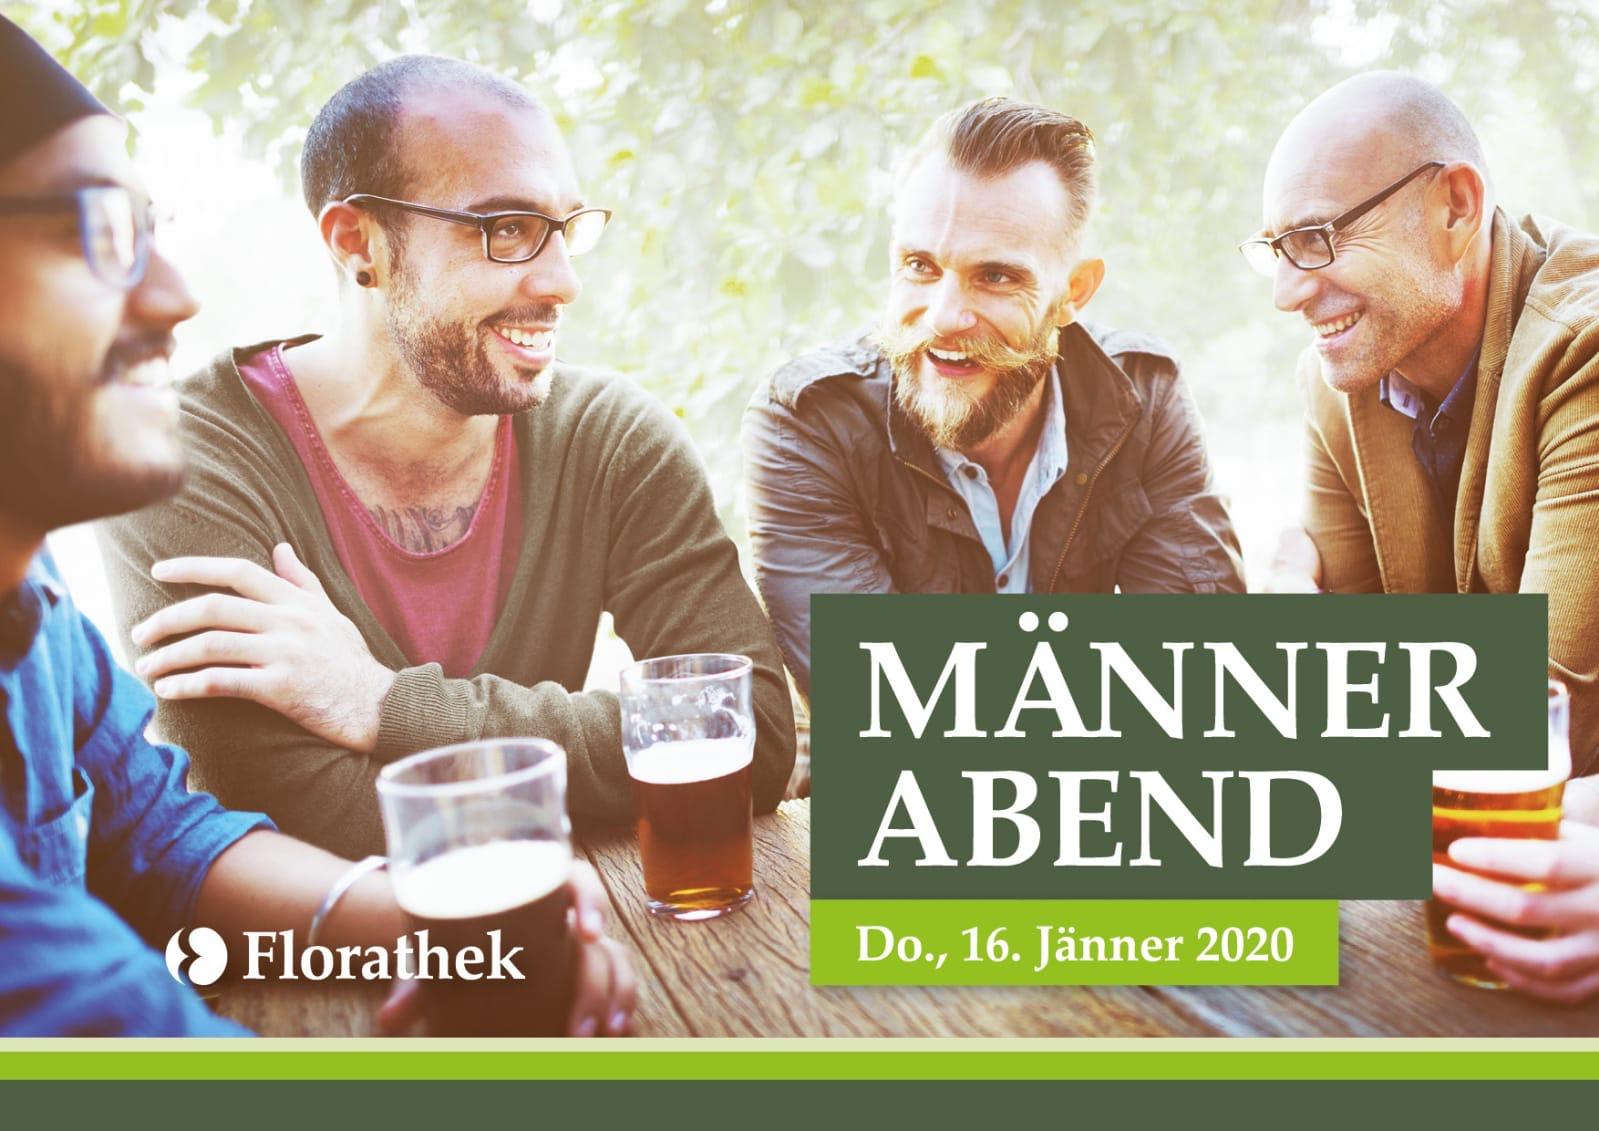 Männerabend in der Florathek Graz 16. Jänner 2020